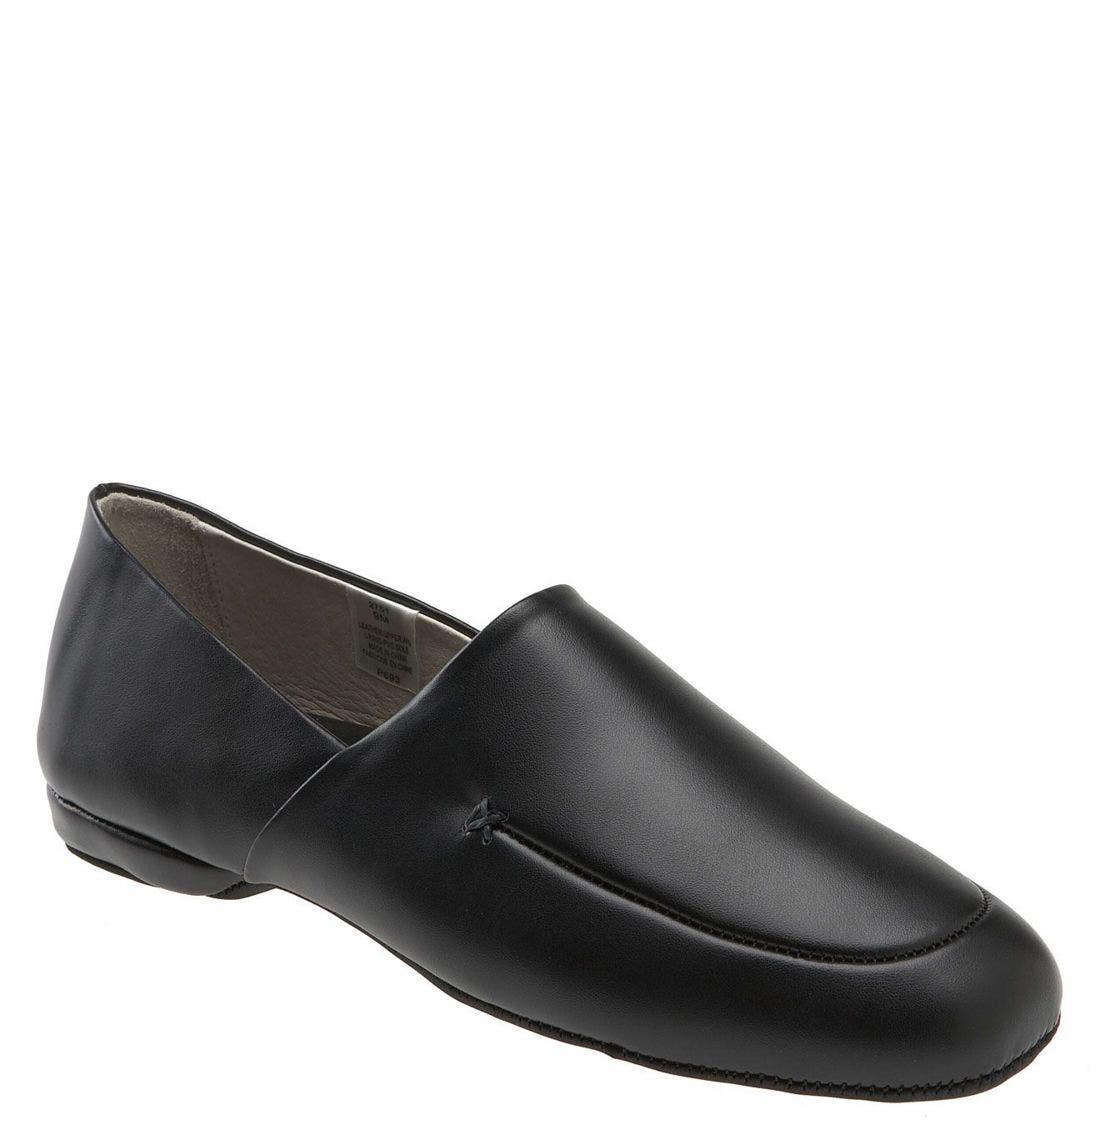 Men's 1950s Shoes Styles- Classics to Saddles to Rockabilly Mens L.b. Evans Duke Opera Slipper Size 9 XW - Black Online Only $49.95 AT vintagedancer.com